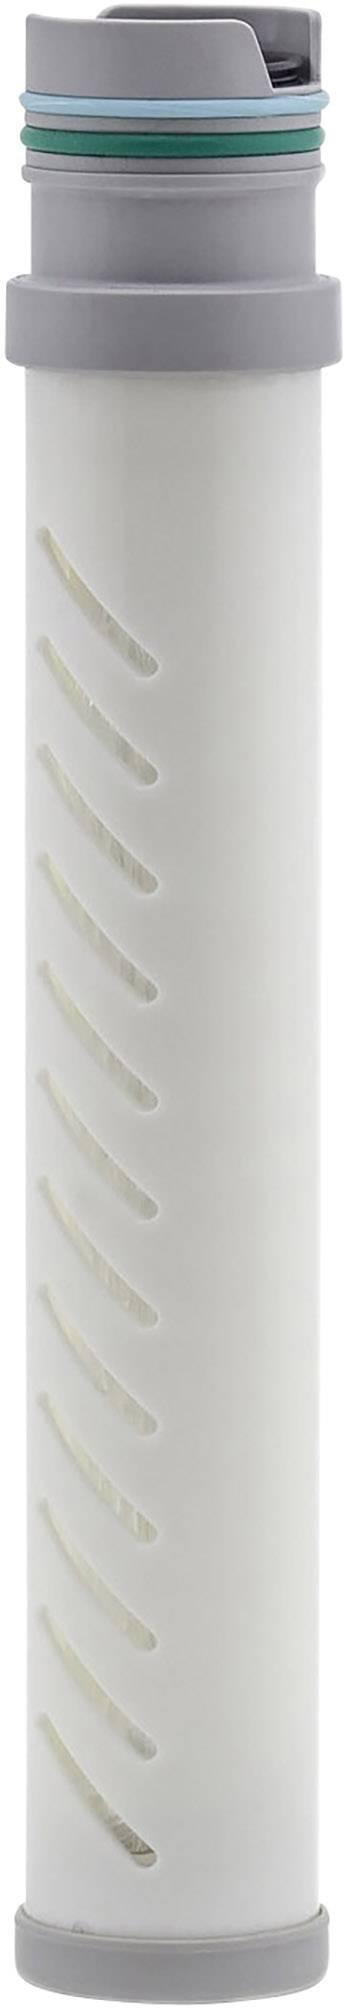 LifeStraw vodní filtr plast 006-6002123 Go 2-Filter (white)